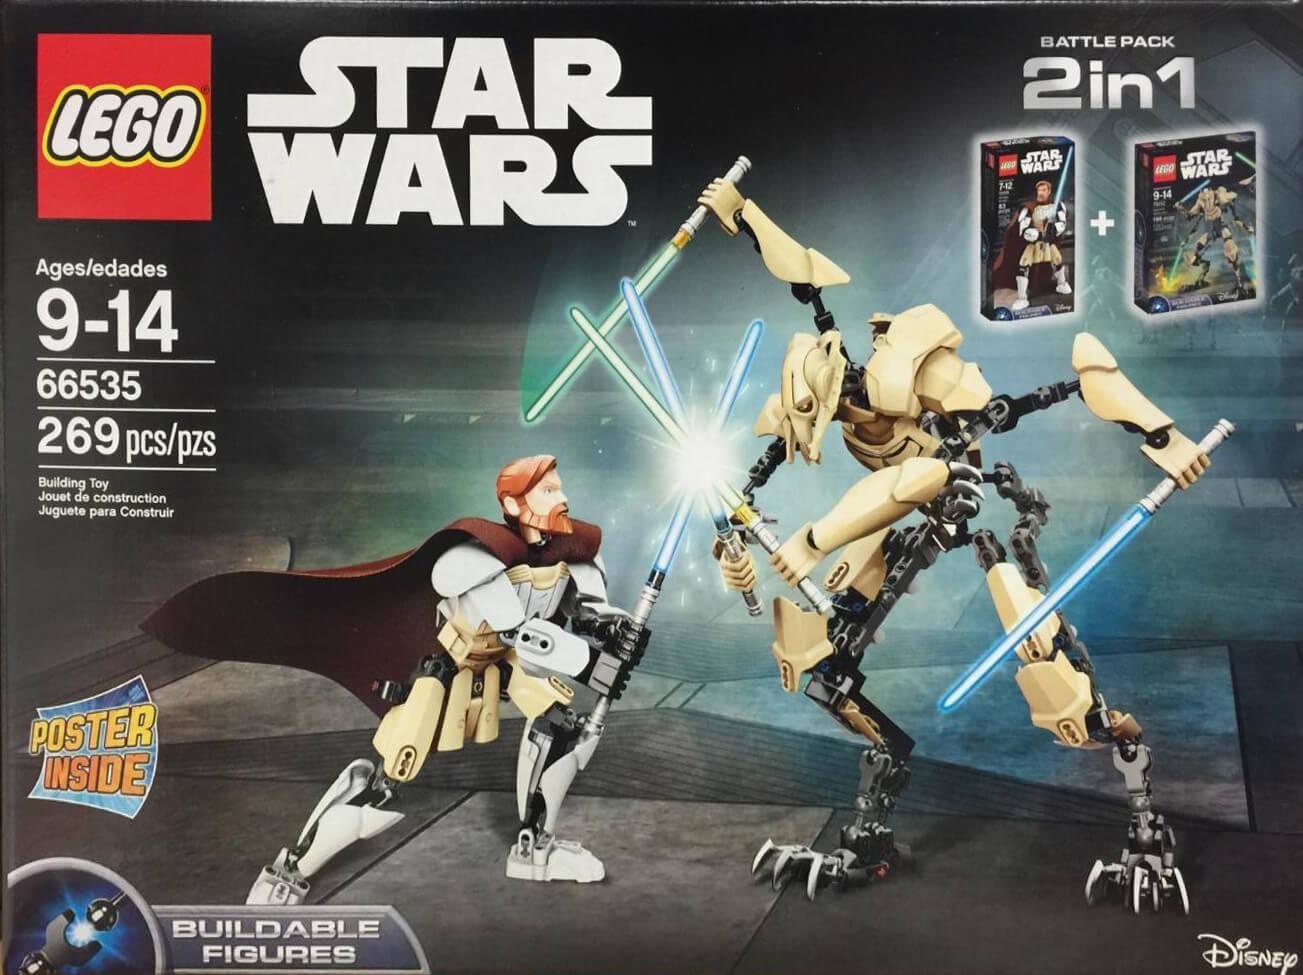 Mua đồ chơi LEGO 66535 - LEGO Star Wars 66535 - Grievous đại chiến Obi-Wan Kenobi (LEGO Star Wars 66535 Battle Pack 2 in 1: Grievous vs. Obi-Wan Kenobi, Mã: 66535)